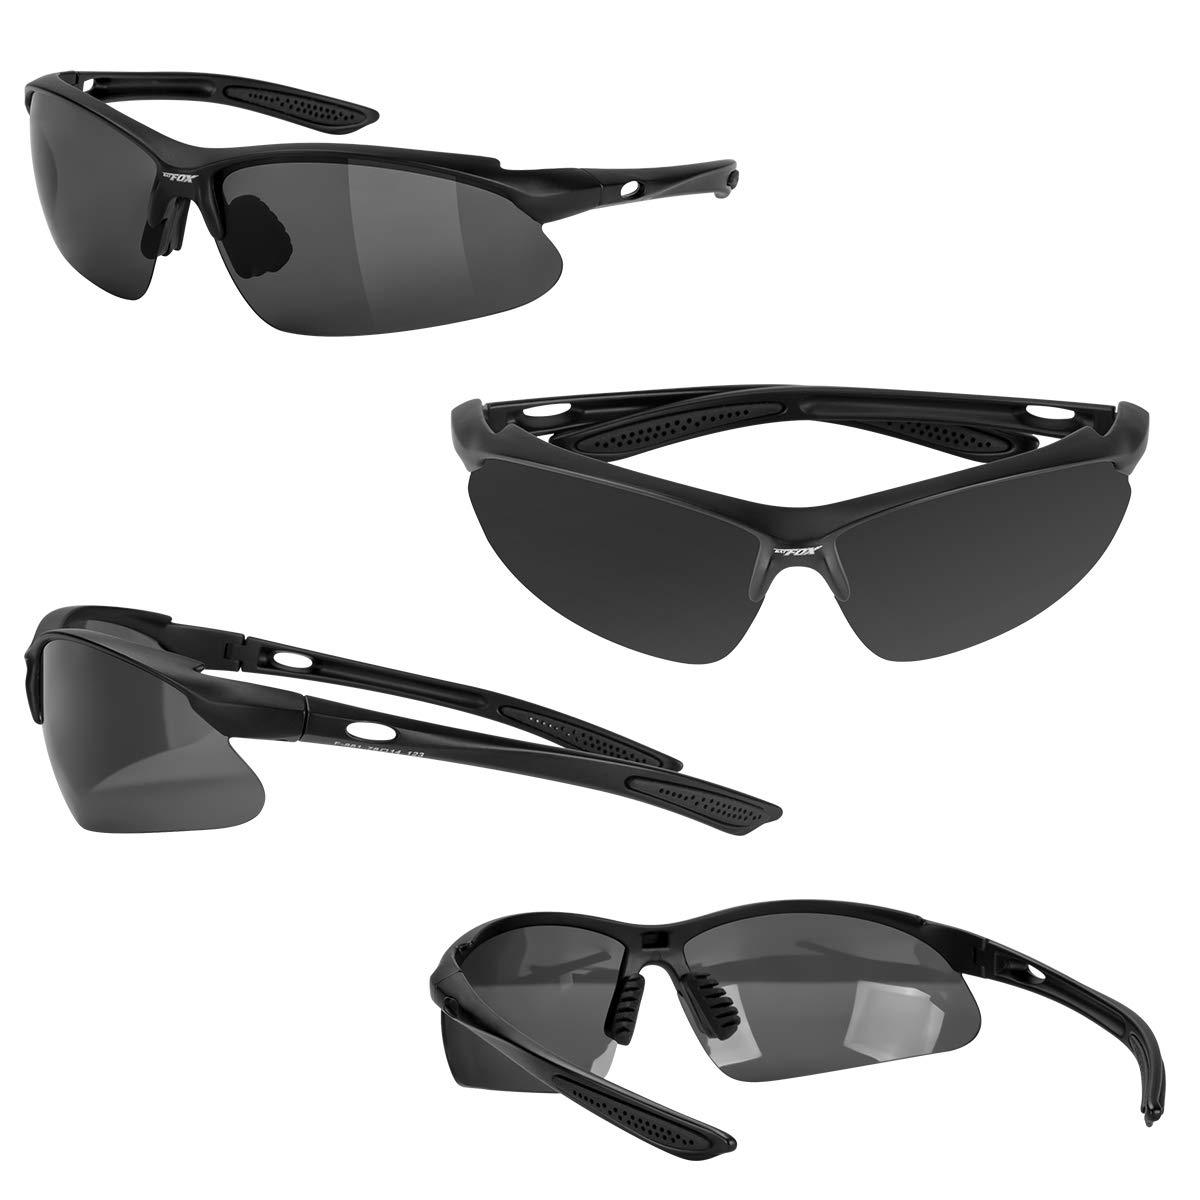 802bf3bcb7a6 Amazon.com : BATFOX Mens Sports Sunglasses Glasses Polarized for Men Women  Youth Running Cycling Baseball Fishing Driving 100% UV Protection  Interchangeable ...